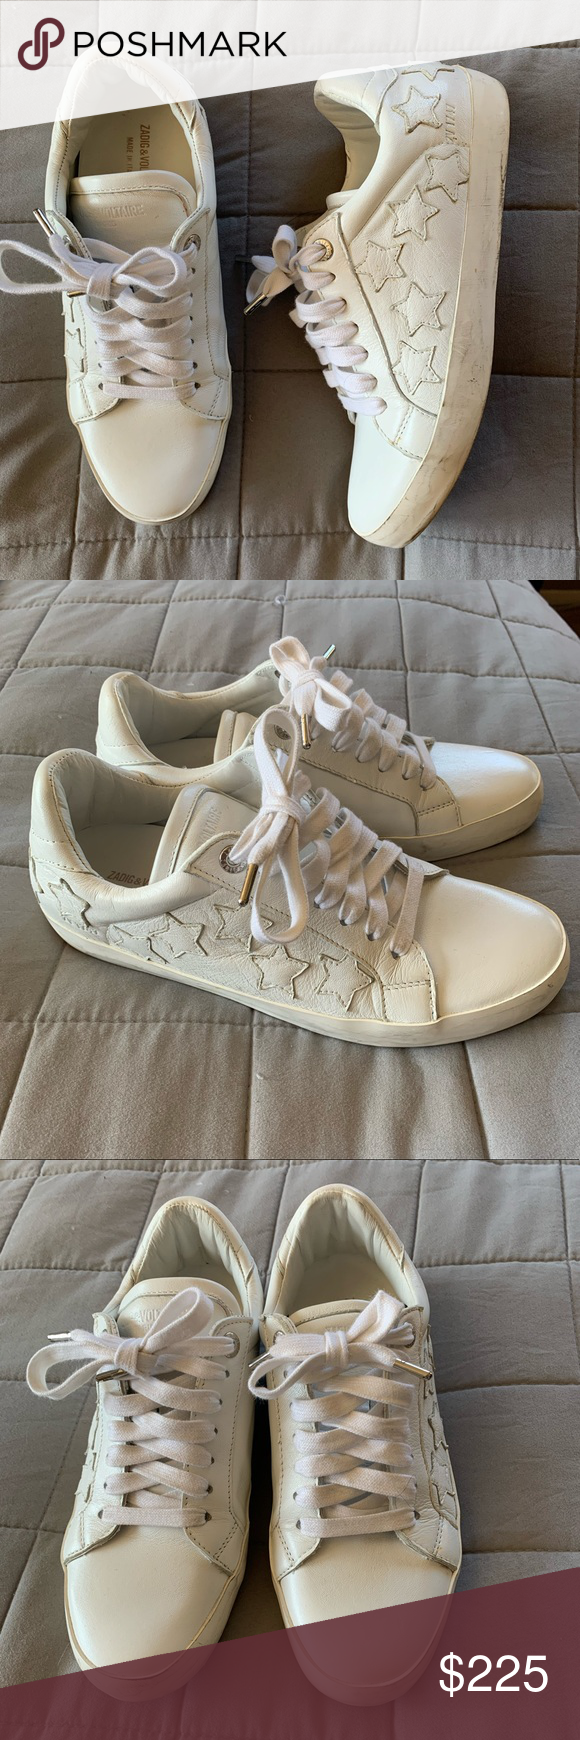 Zadig \u0026 Voltaire Star sneakers 39 white